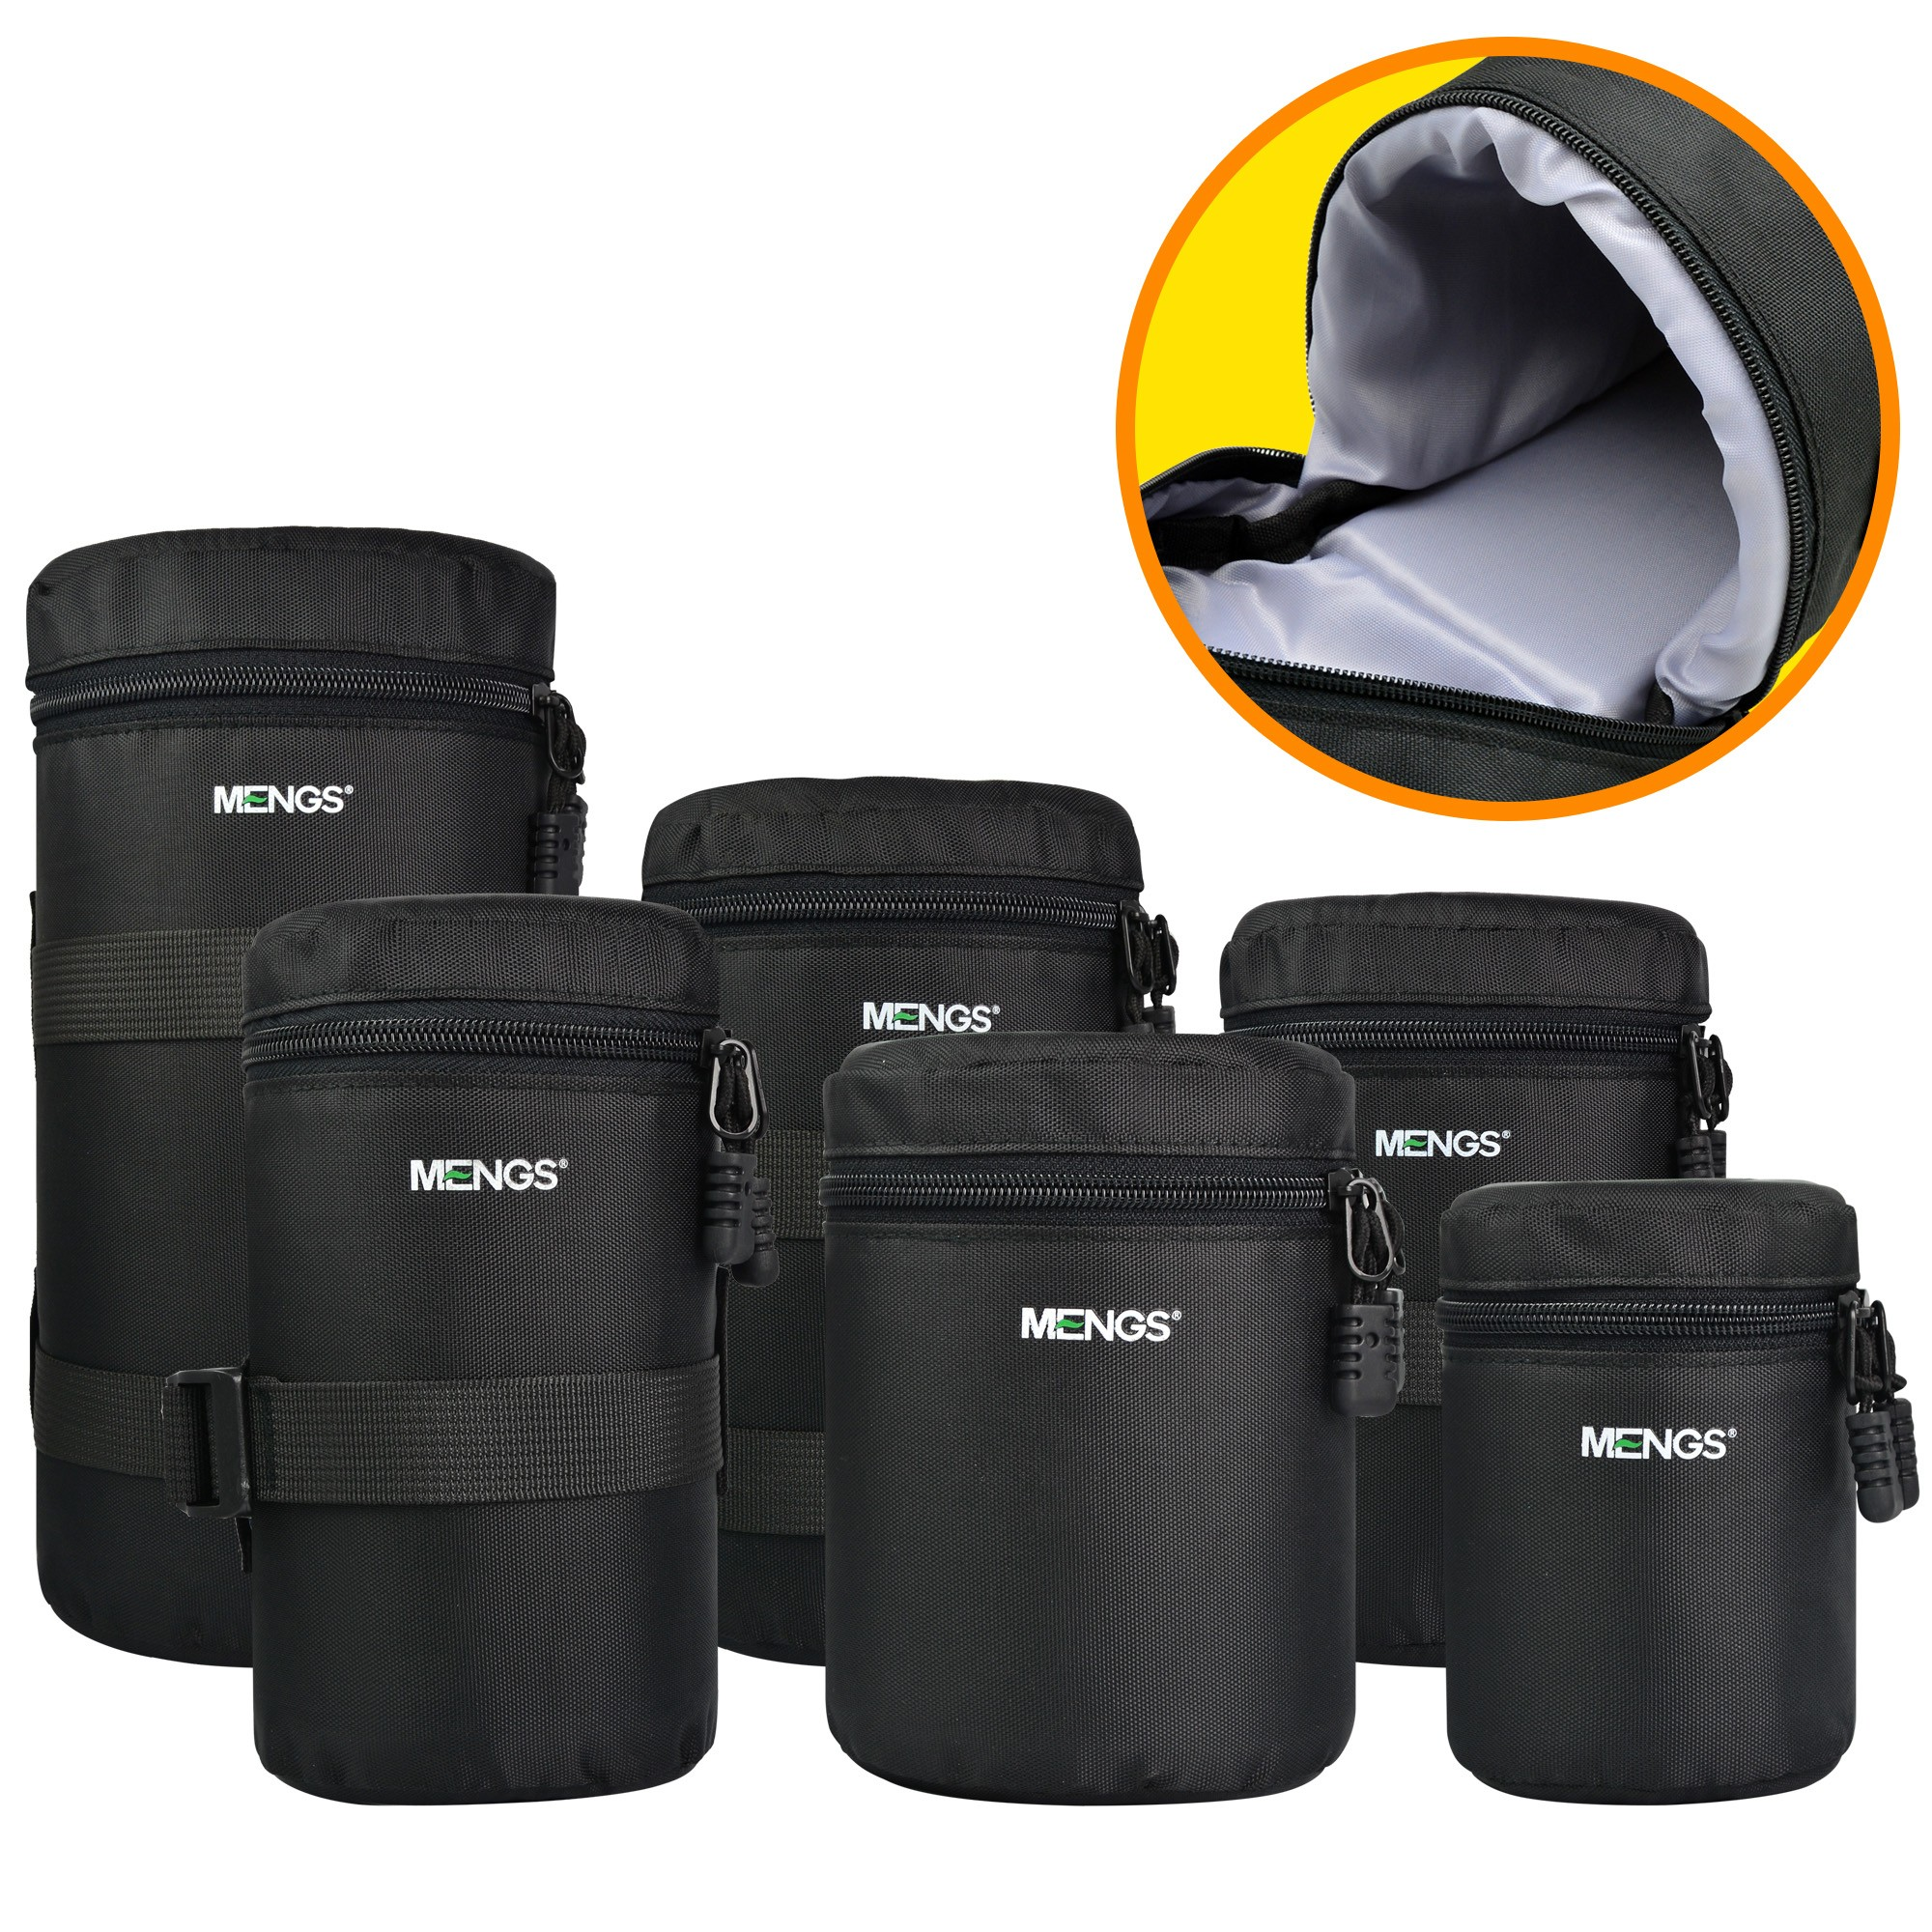 Mengsphoto Lens Pouch Amp Lens Bag